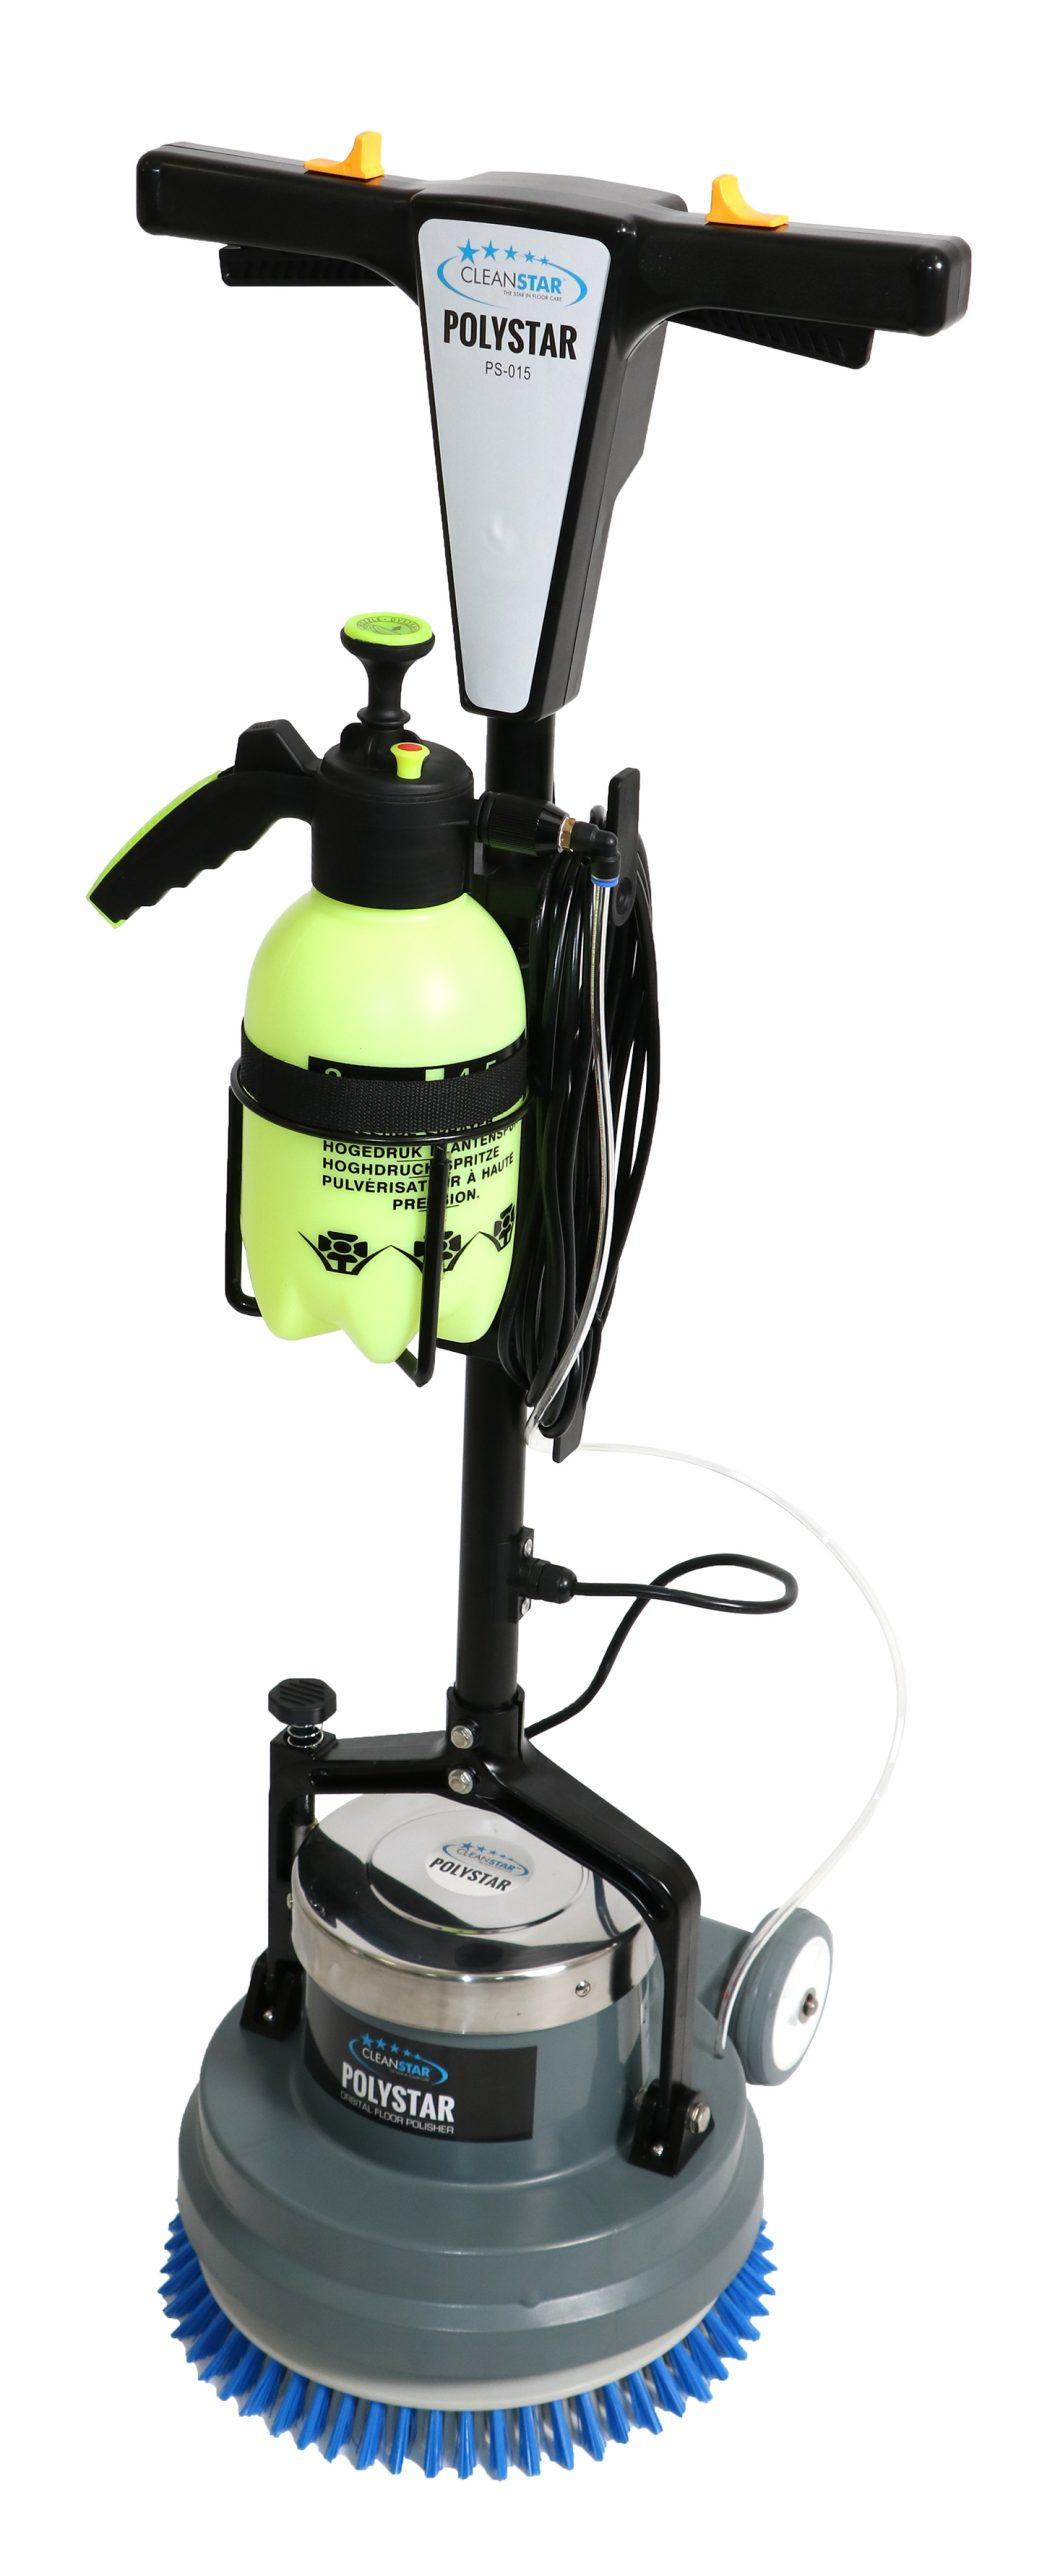 Polystar 15-inch Orbital Floor Polisher & Cleaner